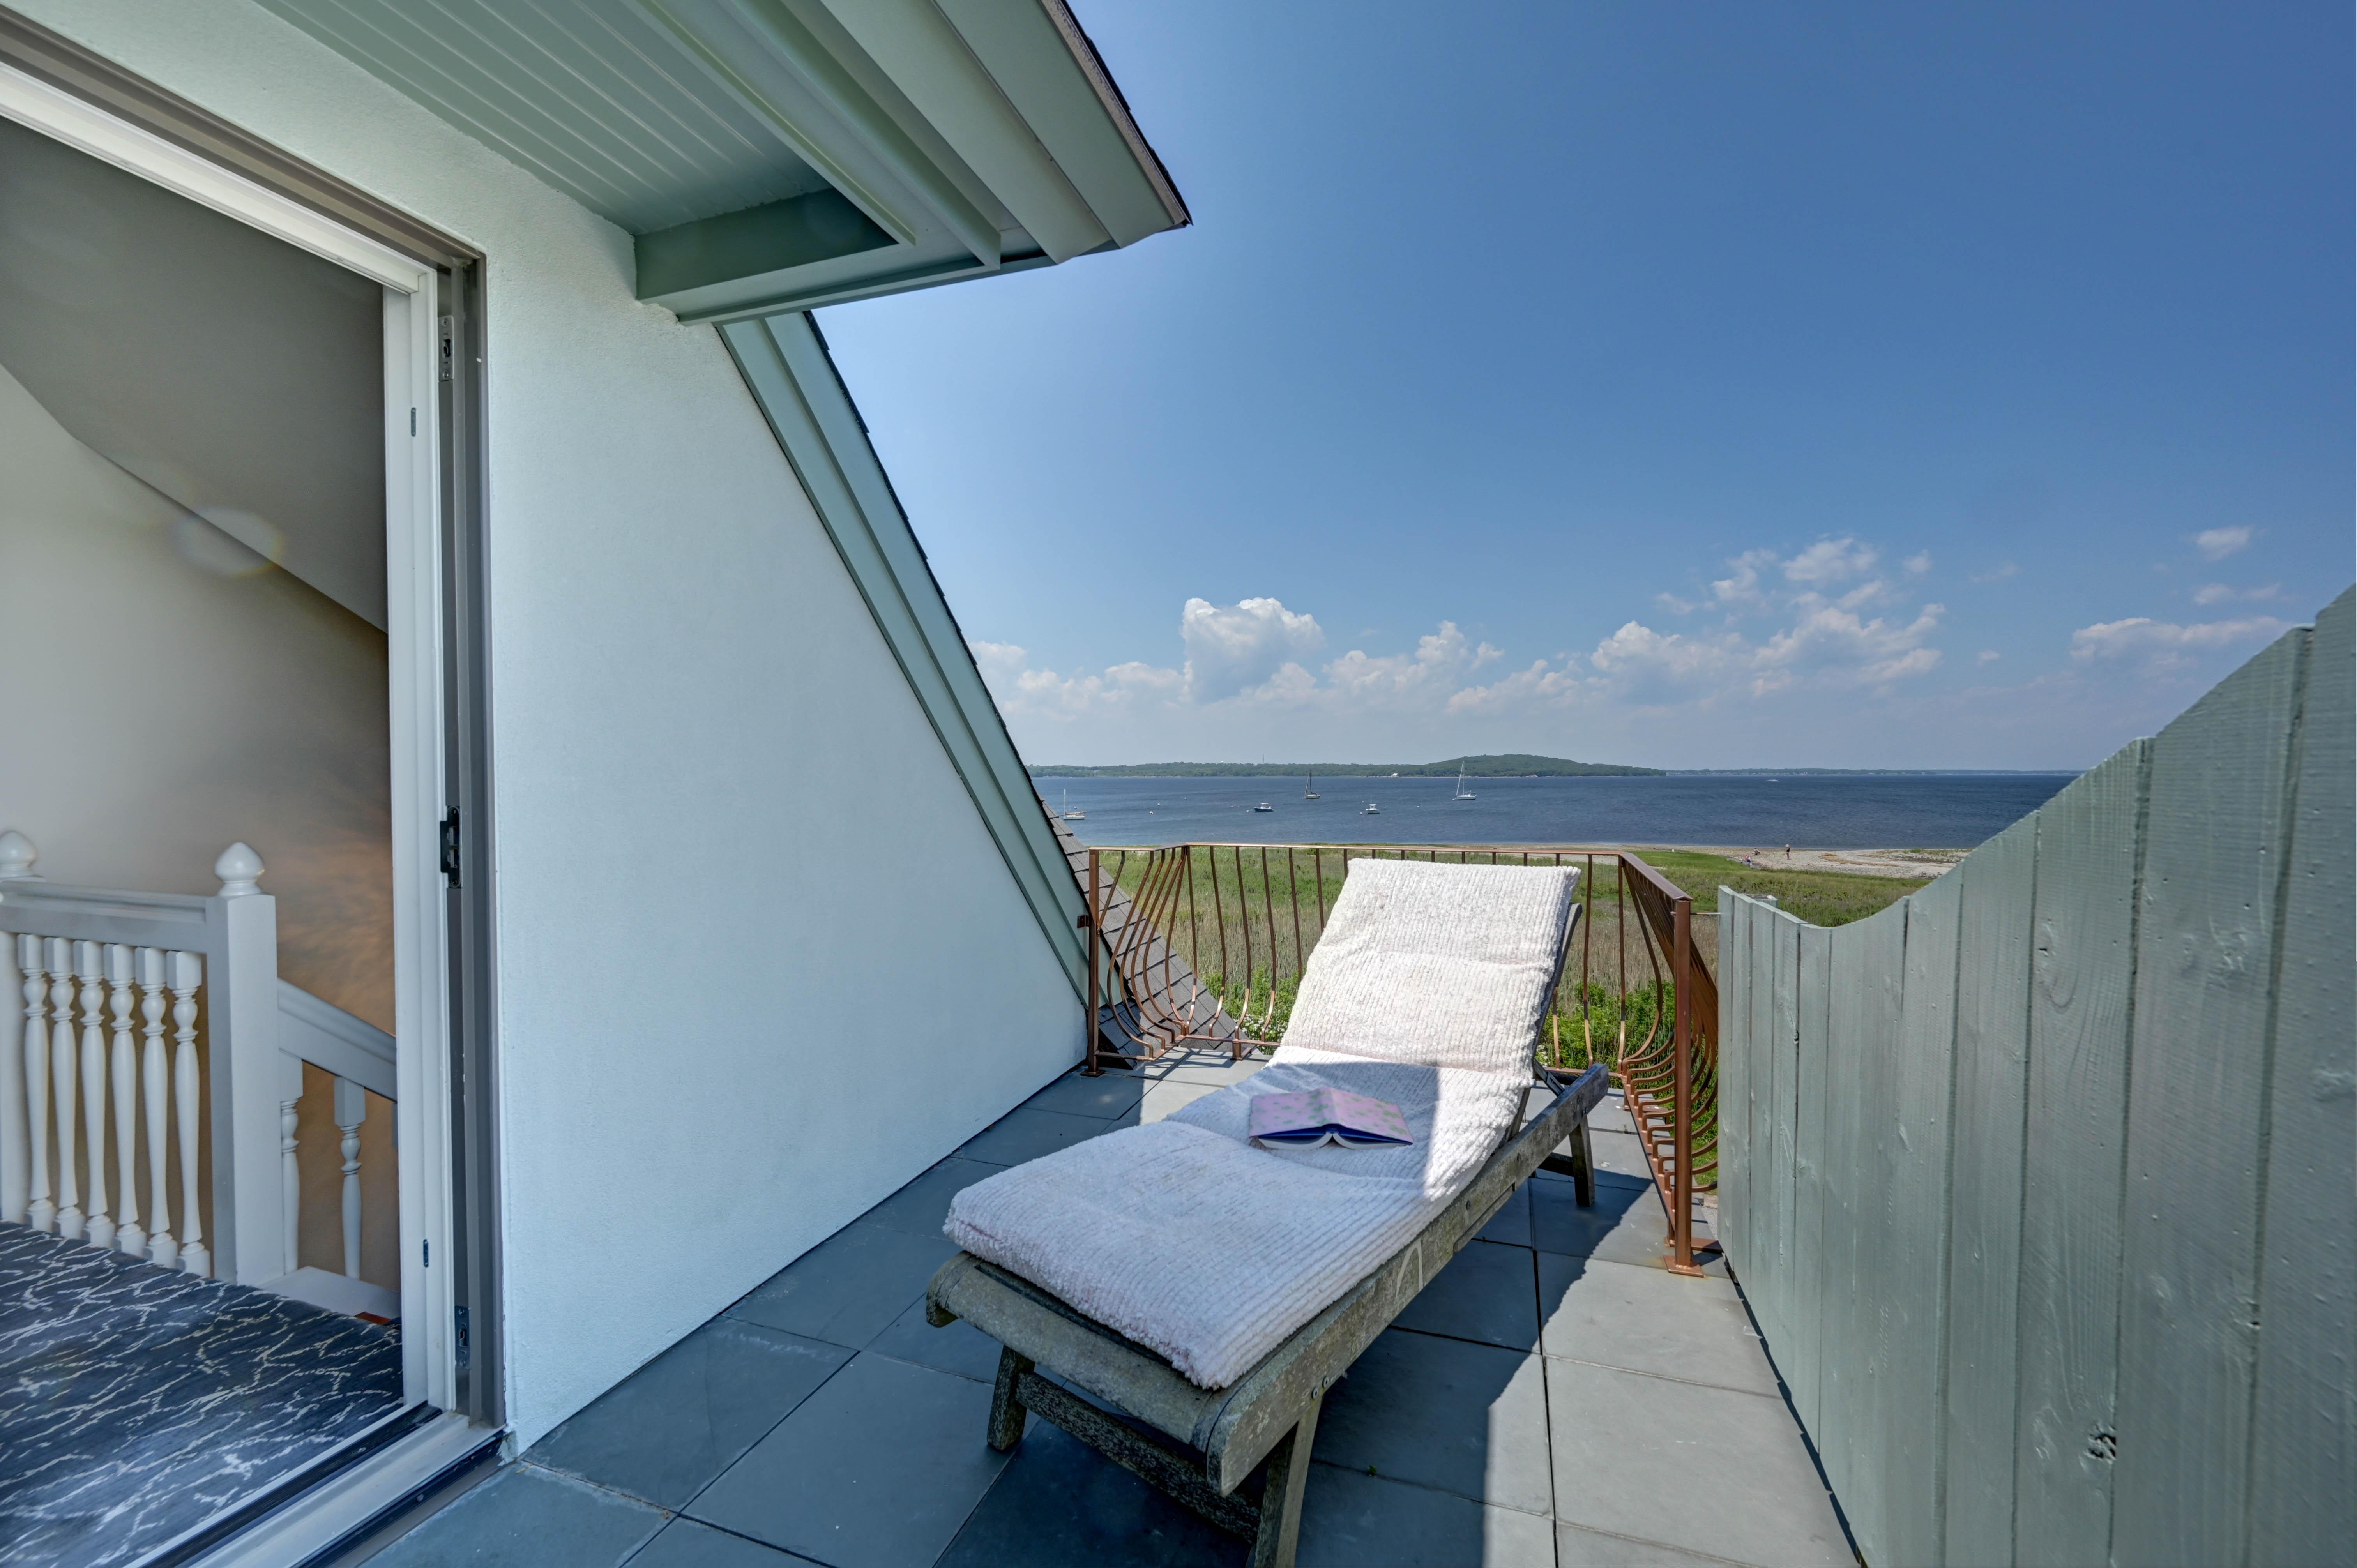 130-common-fence-portsmouth-ri-suite-deck